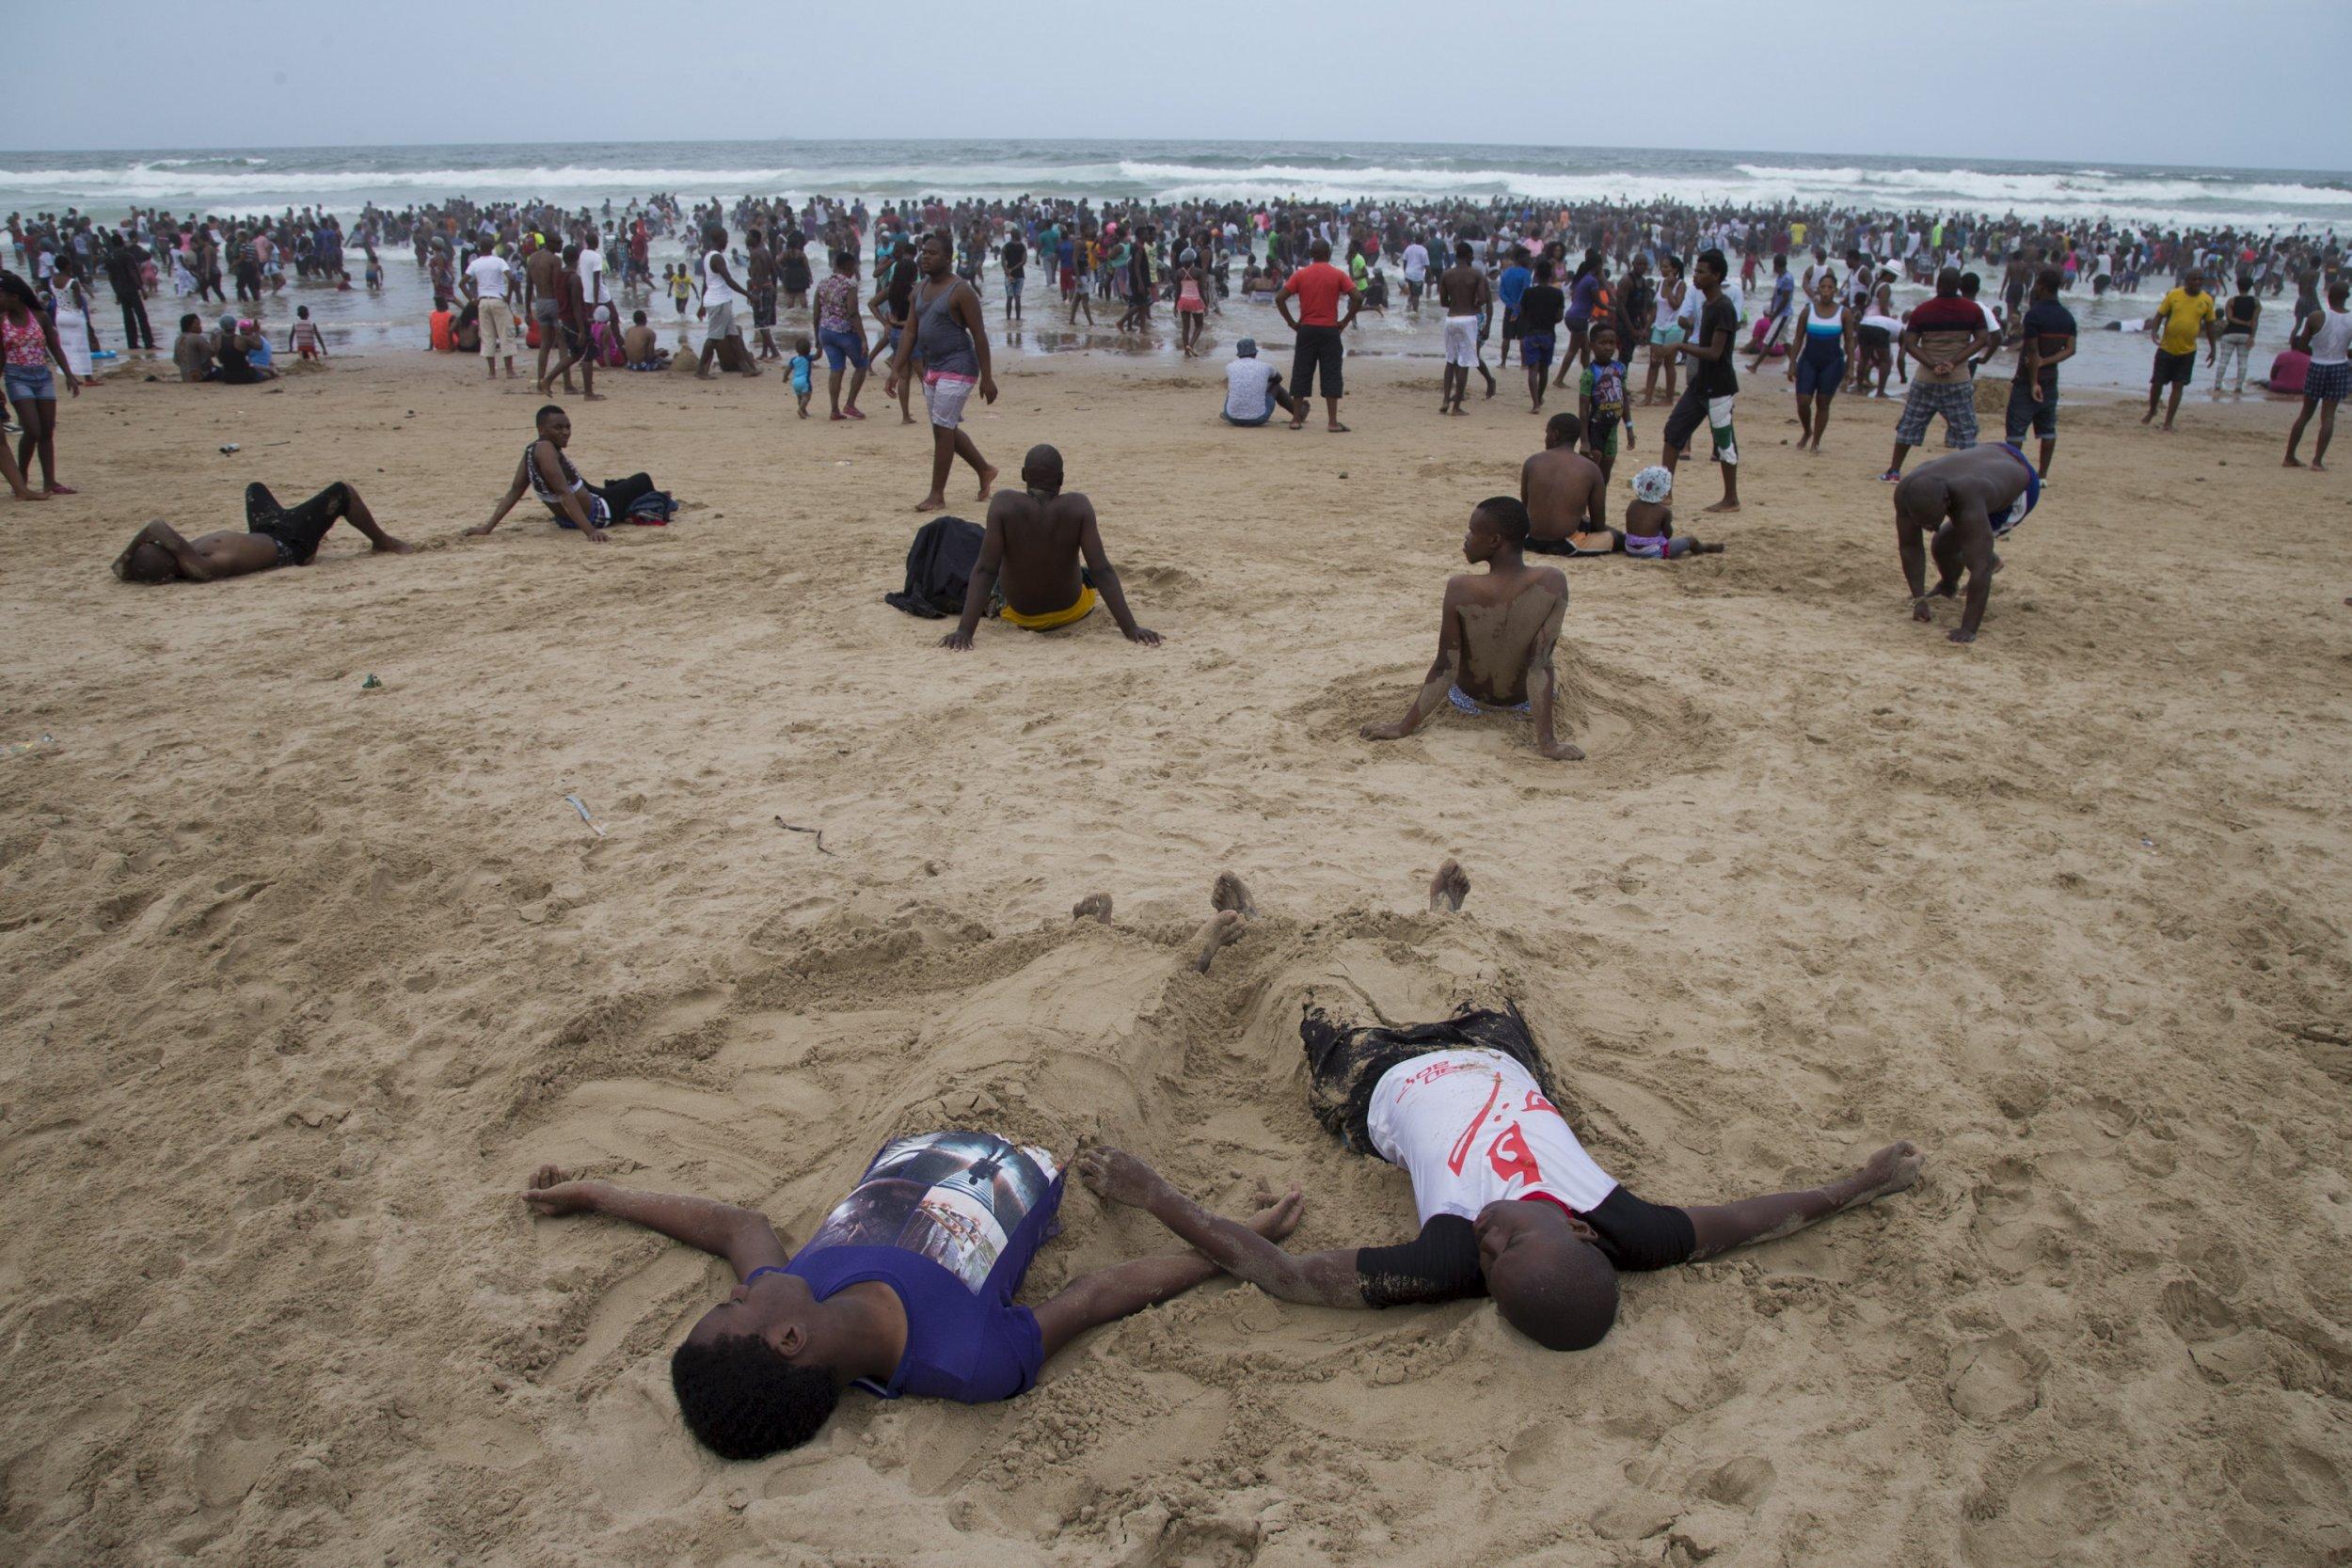 0107_South_Africa_beachgoers